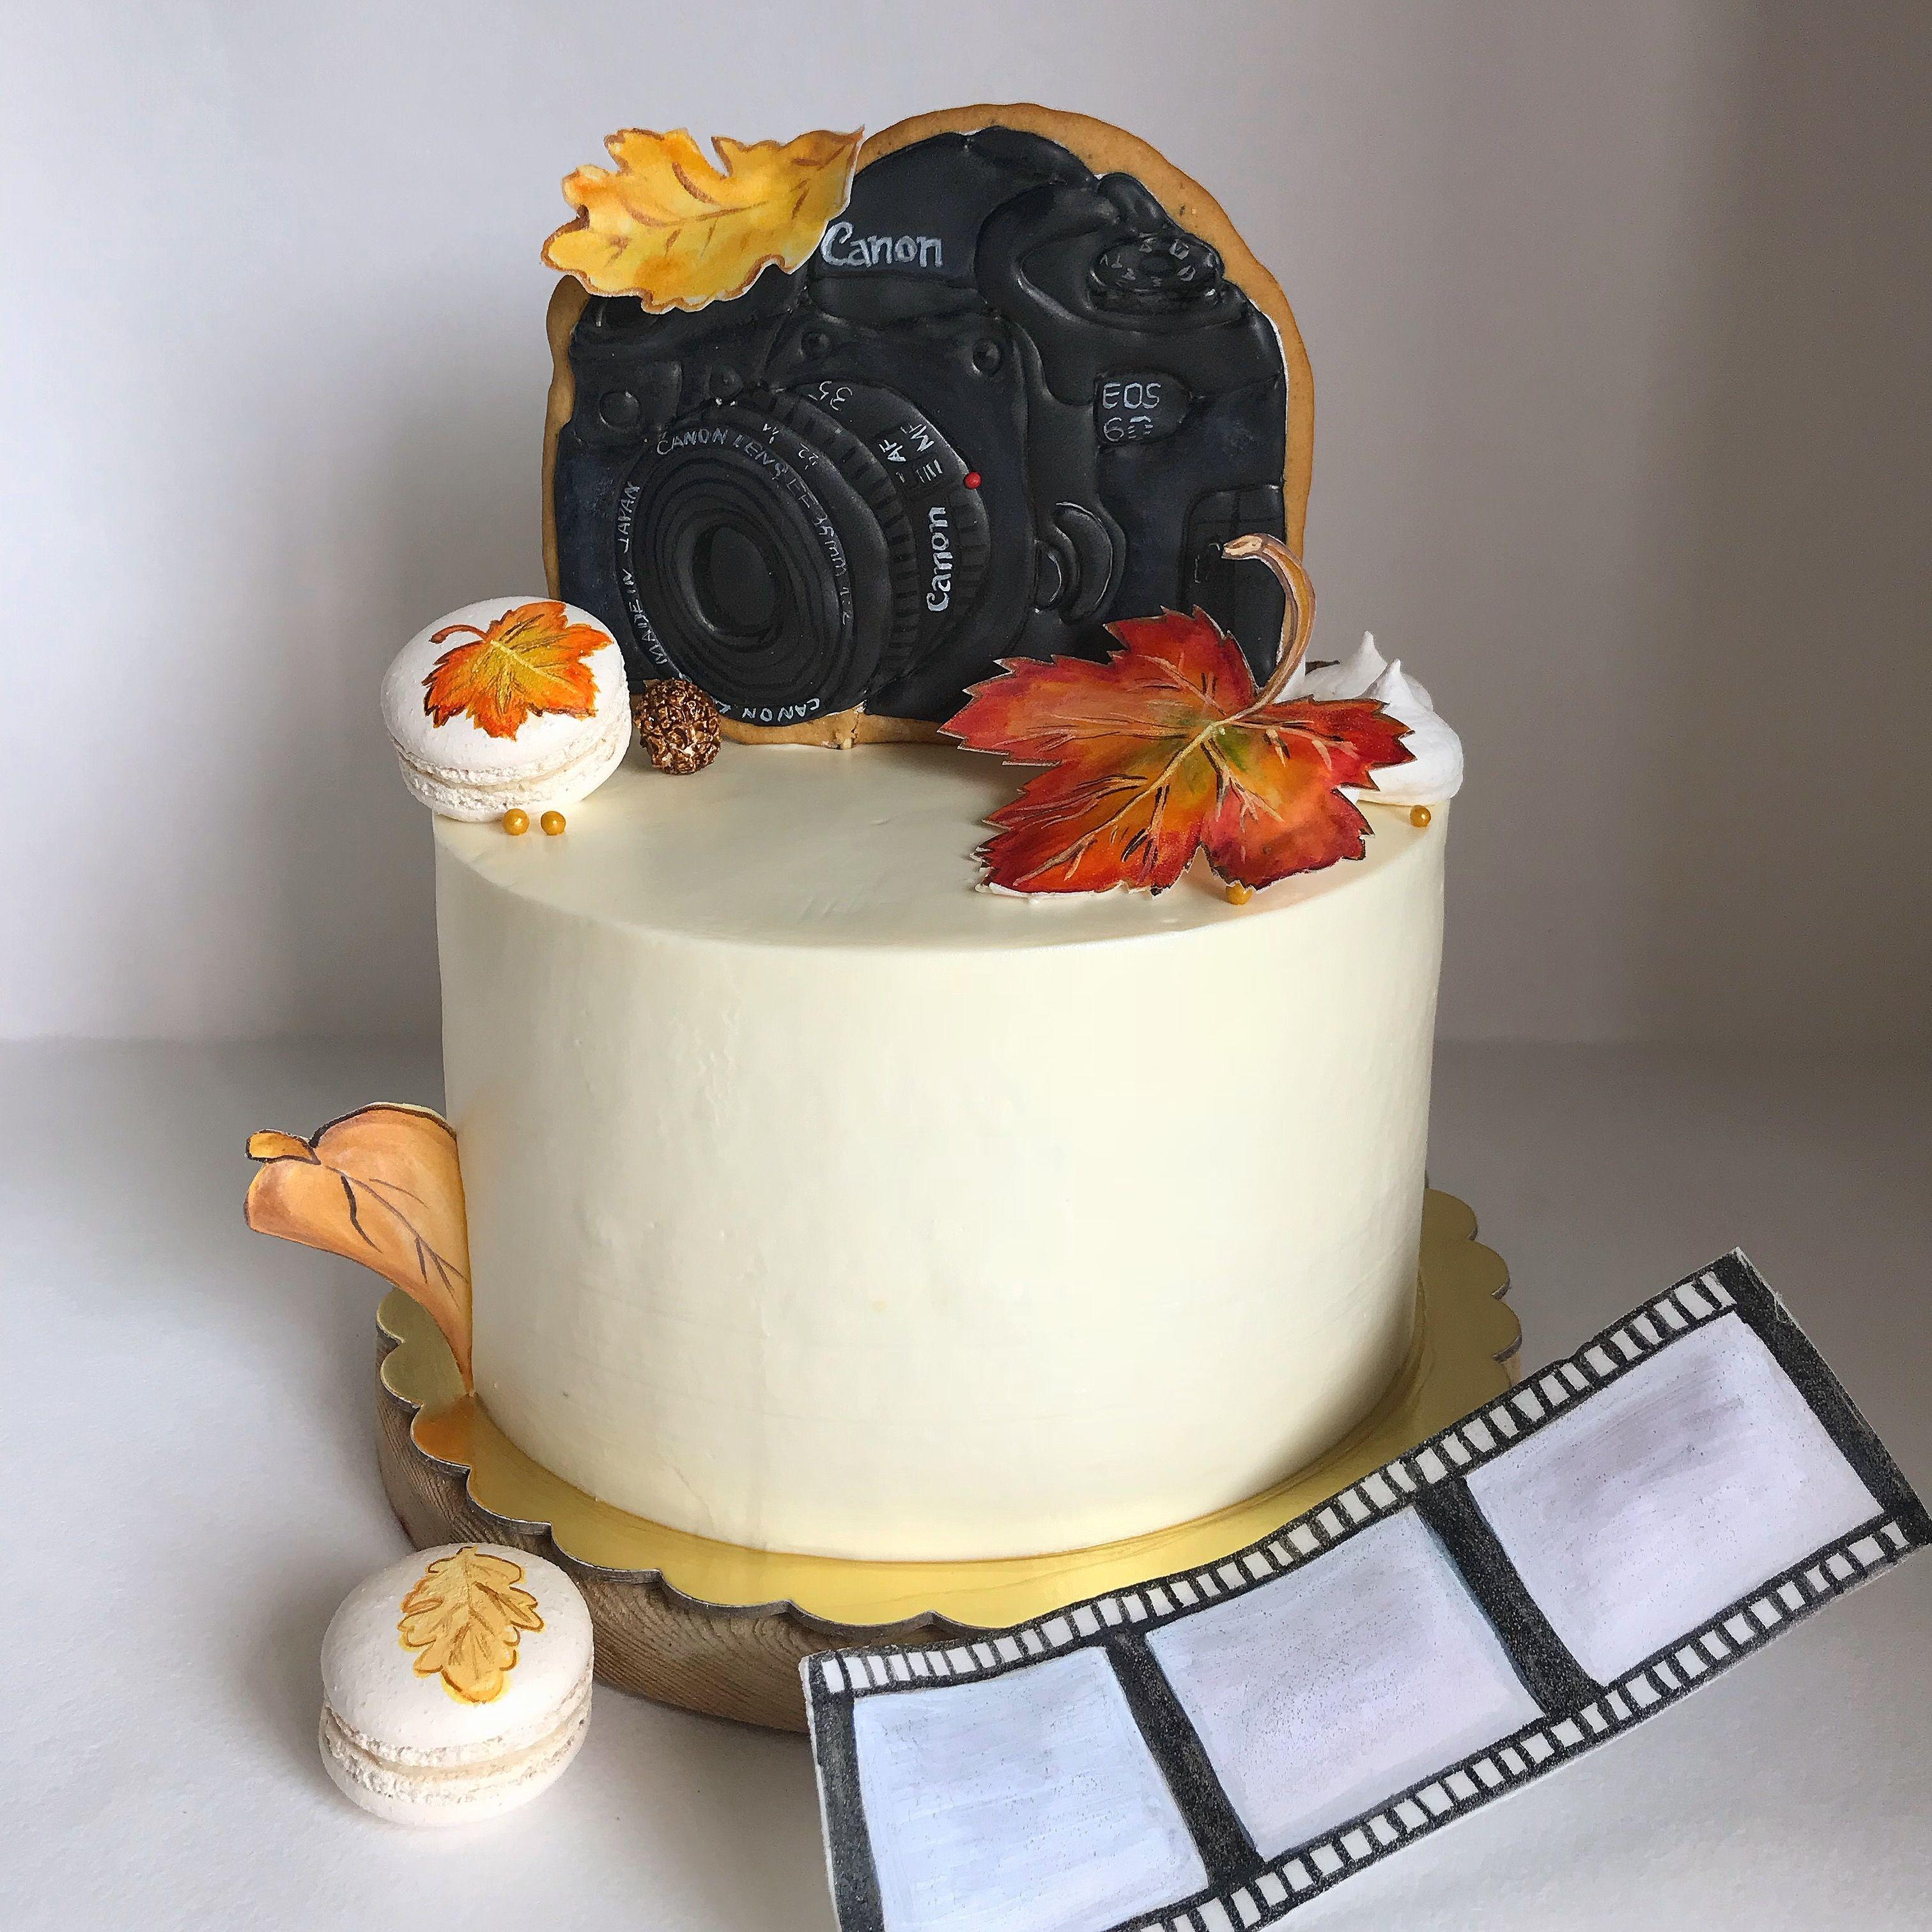 редмонд картинки тортов для фотографа условием для